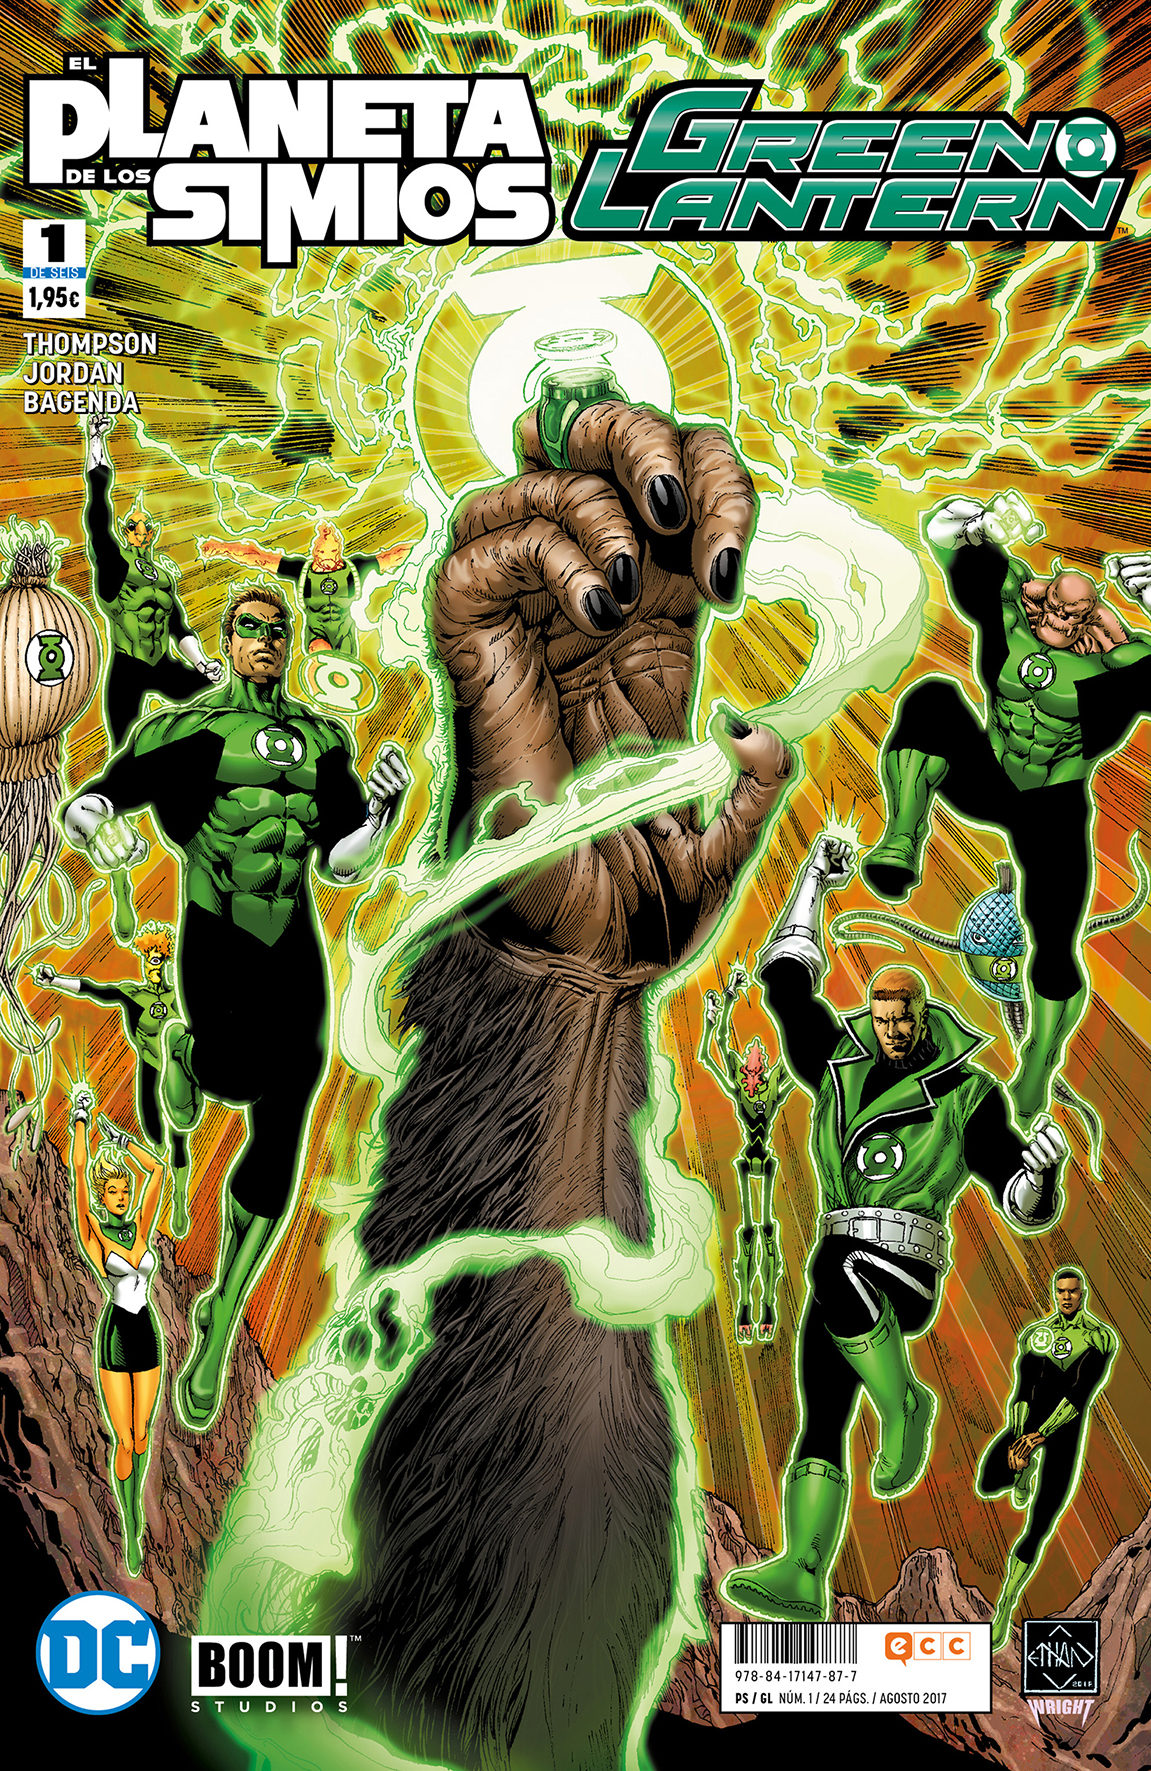 green lantern/el planeta de los simios nº 01 (de 6)-justin jordan-robbie thompson-9788417147877